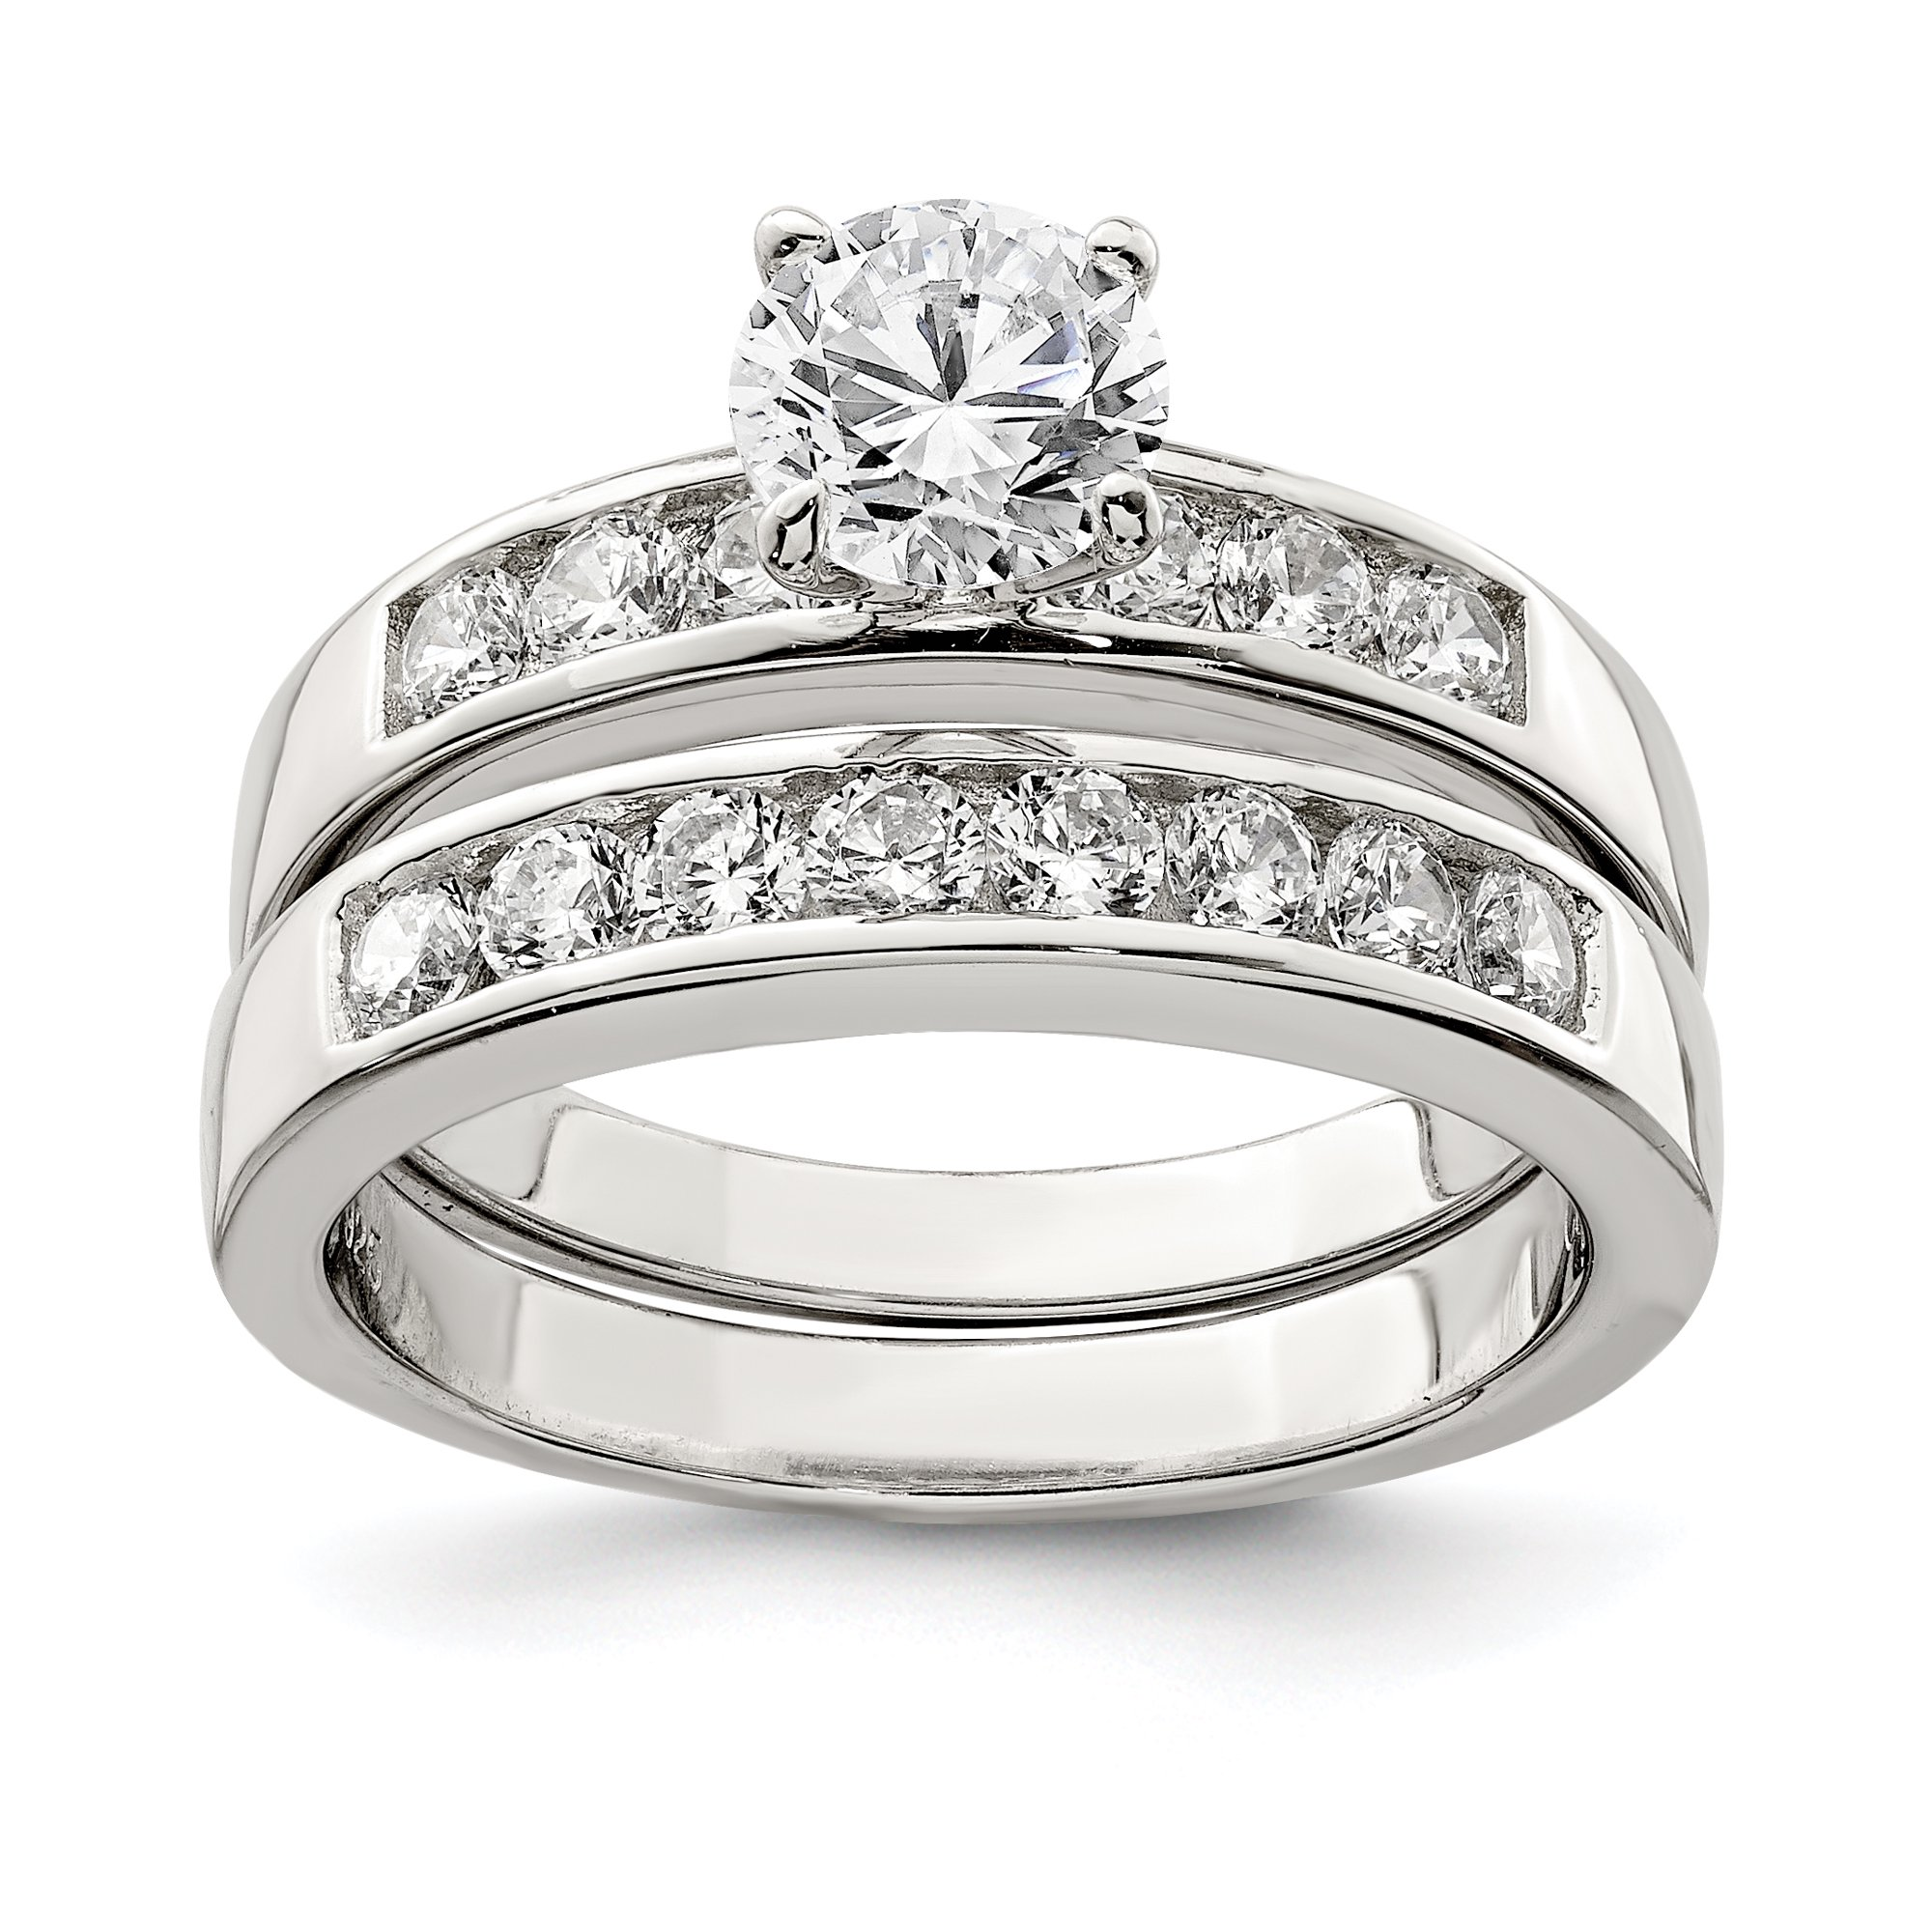 925 Sterling Silver 2 Piece Cubic Zirconia Wedding Set Ring